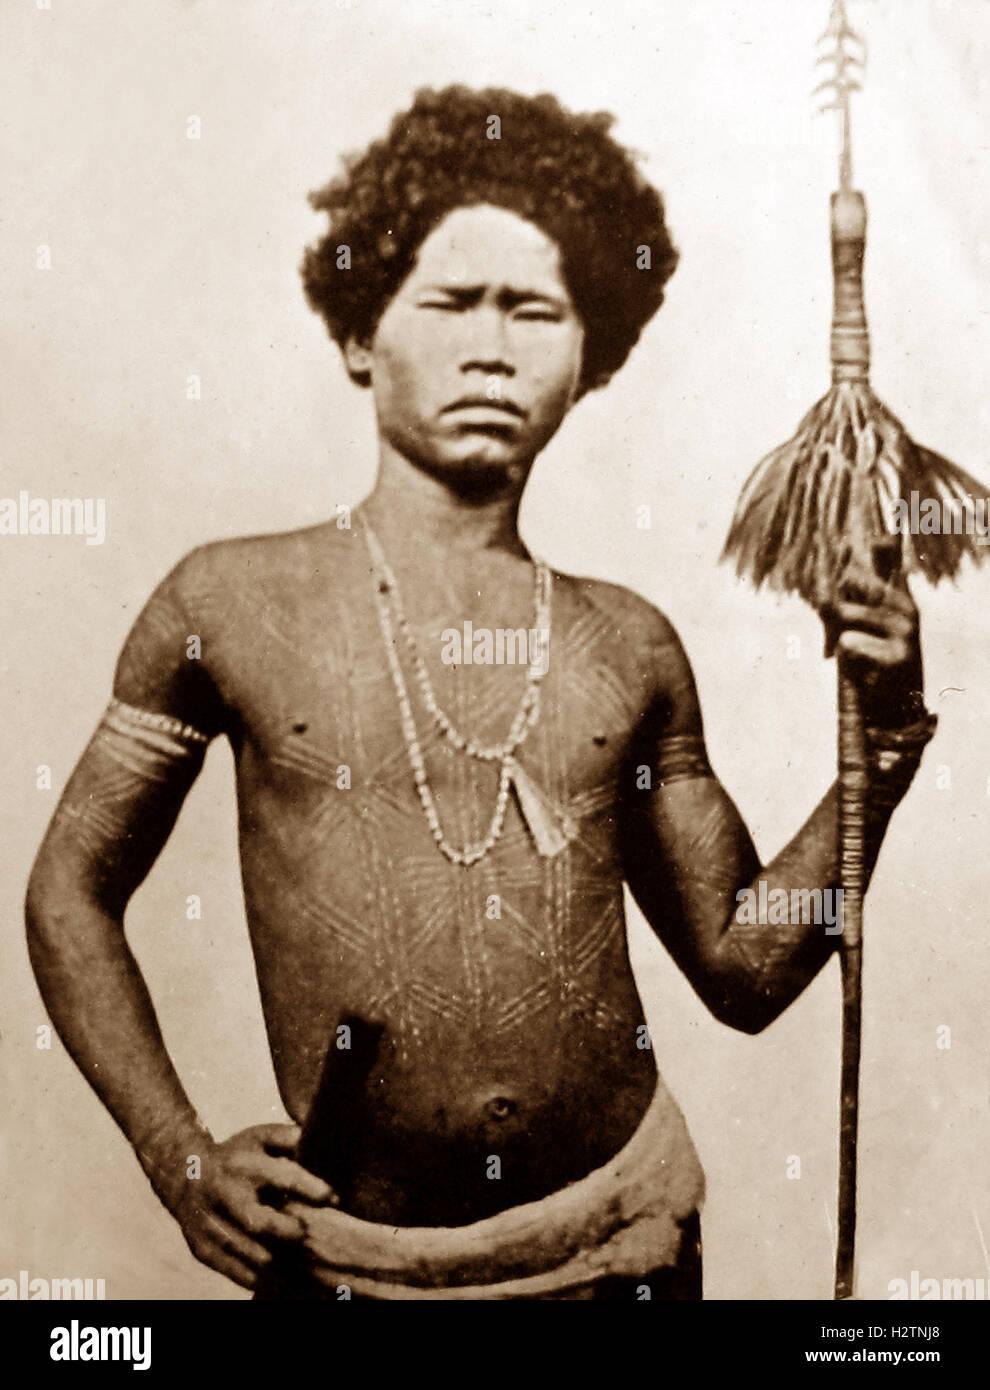 Jamaican warrior - Victorian period - Stock Image